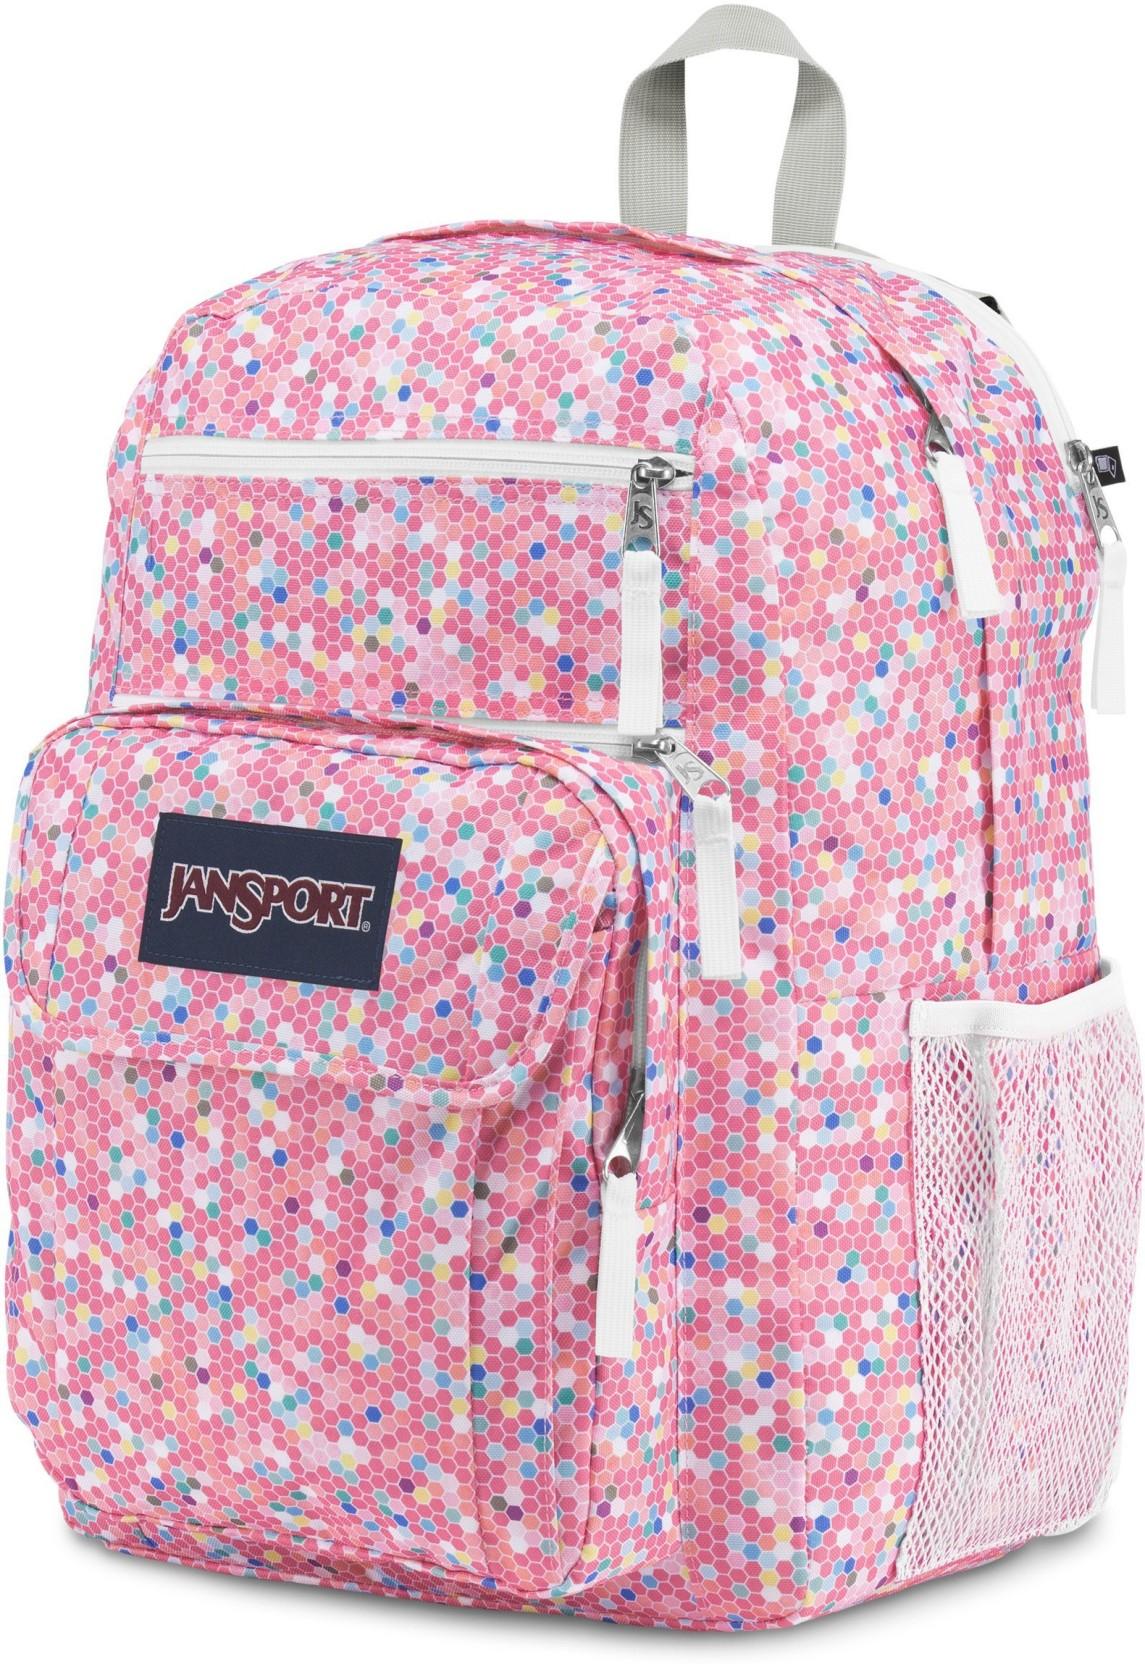 8c69488d74 Jansport Digital Student Backpack Black Dot O Rama - Fairway Golf ...